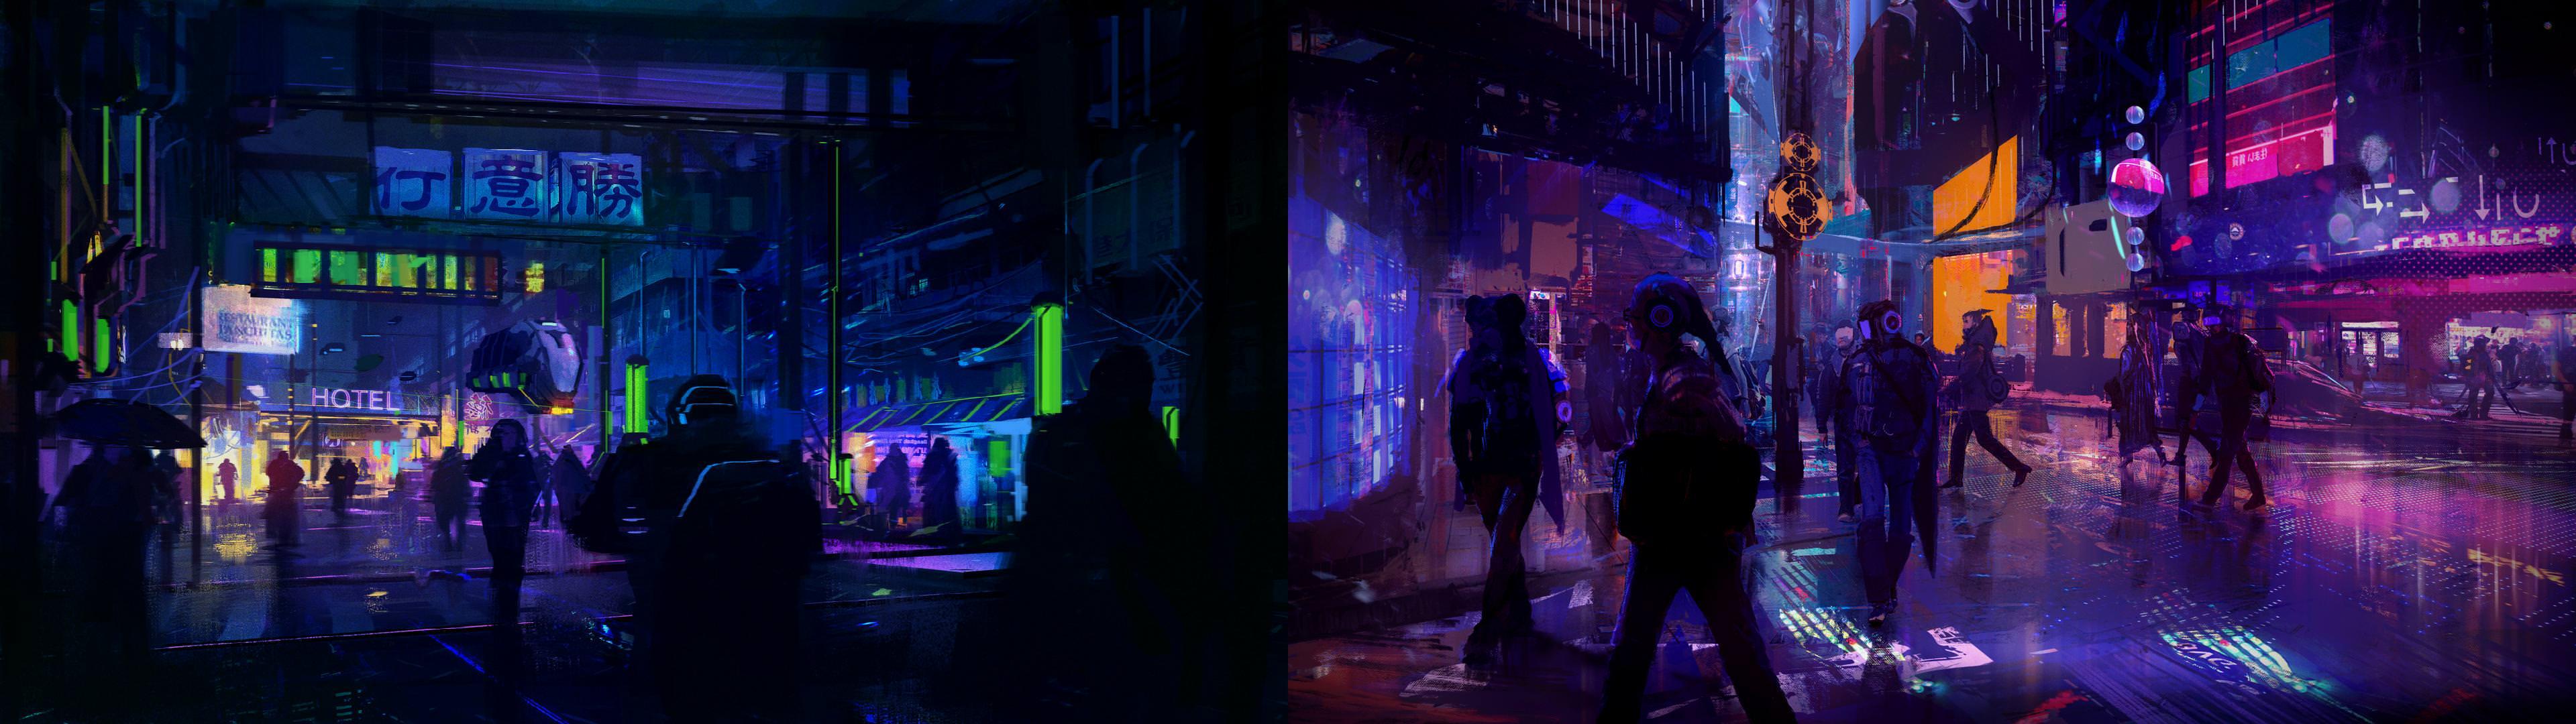 Cyberpunk Dual Screen Wallpapers Top Free Cyberpunk Dual Screen Backgrounds Wallpaperaccess